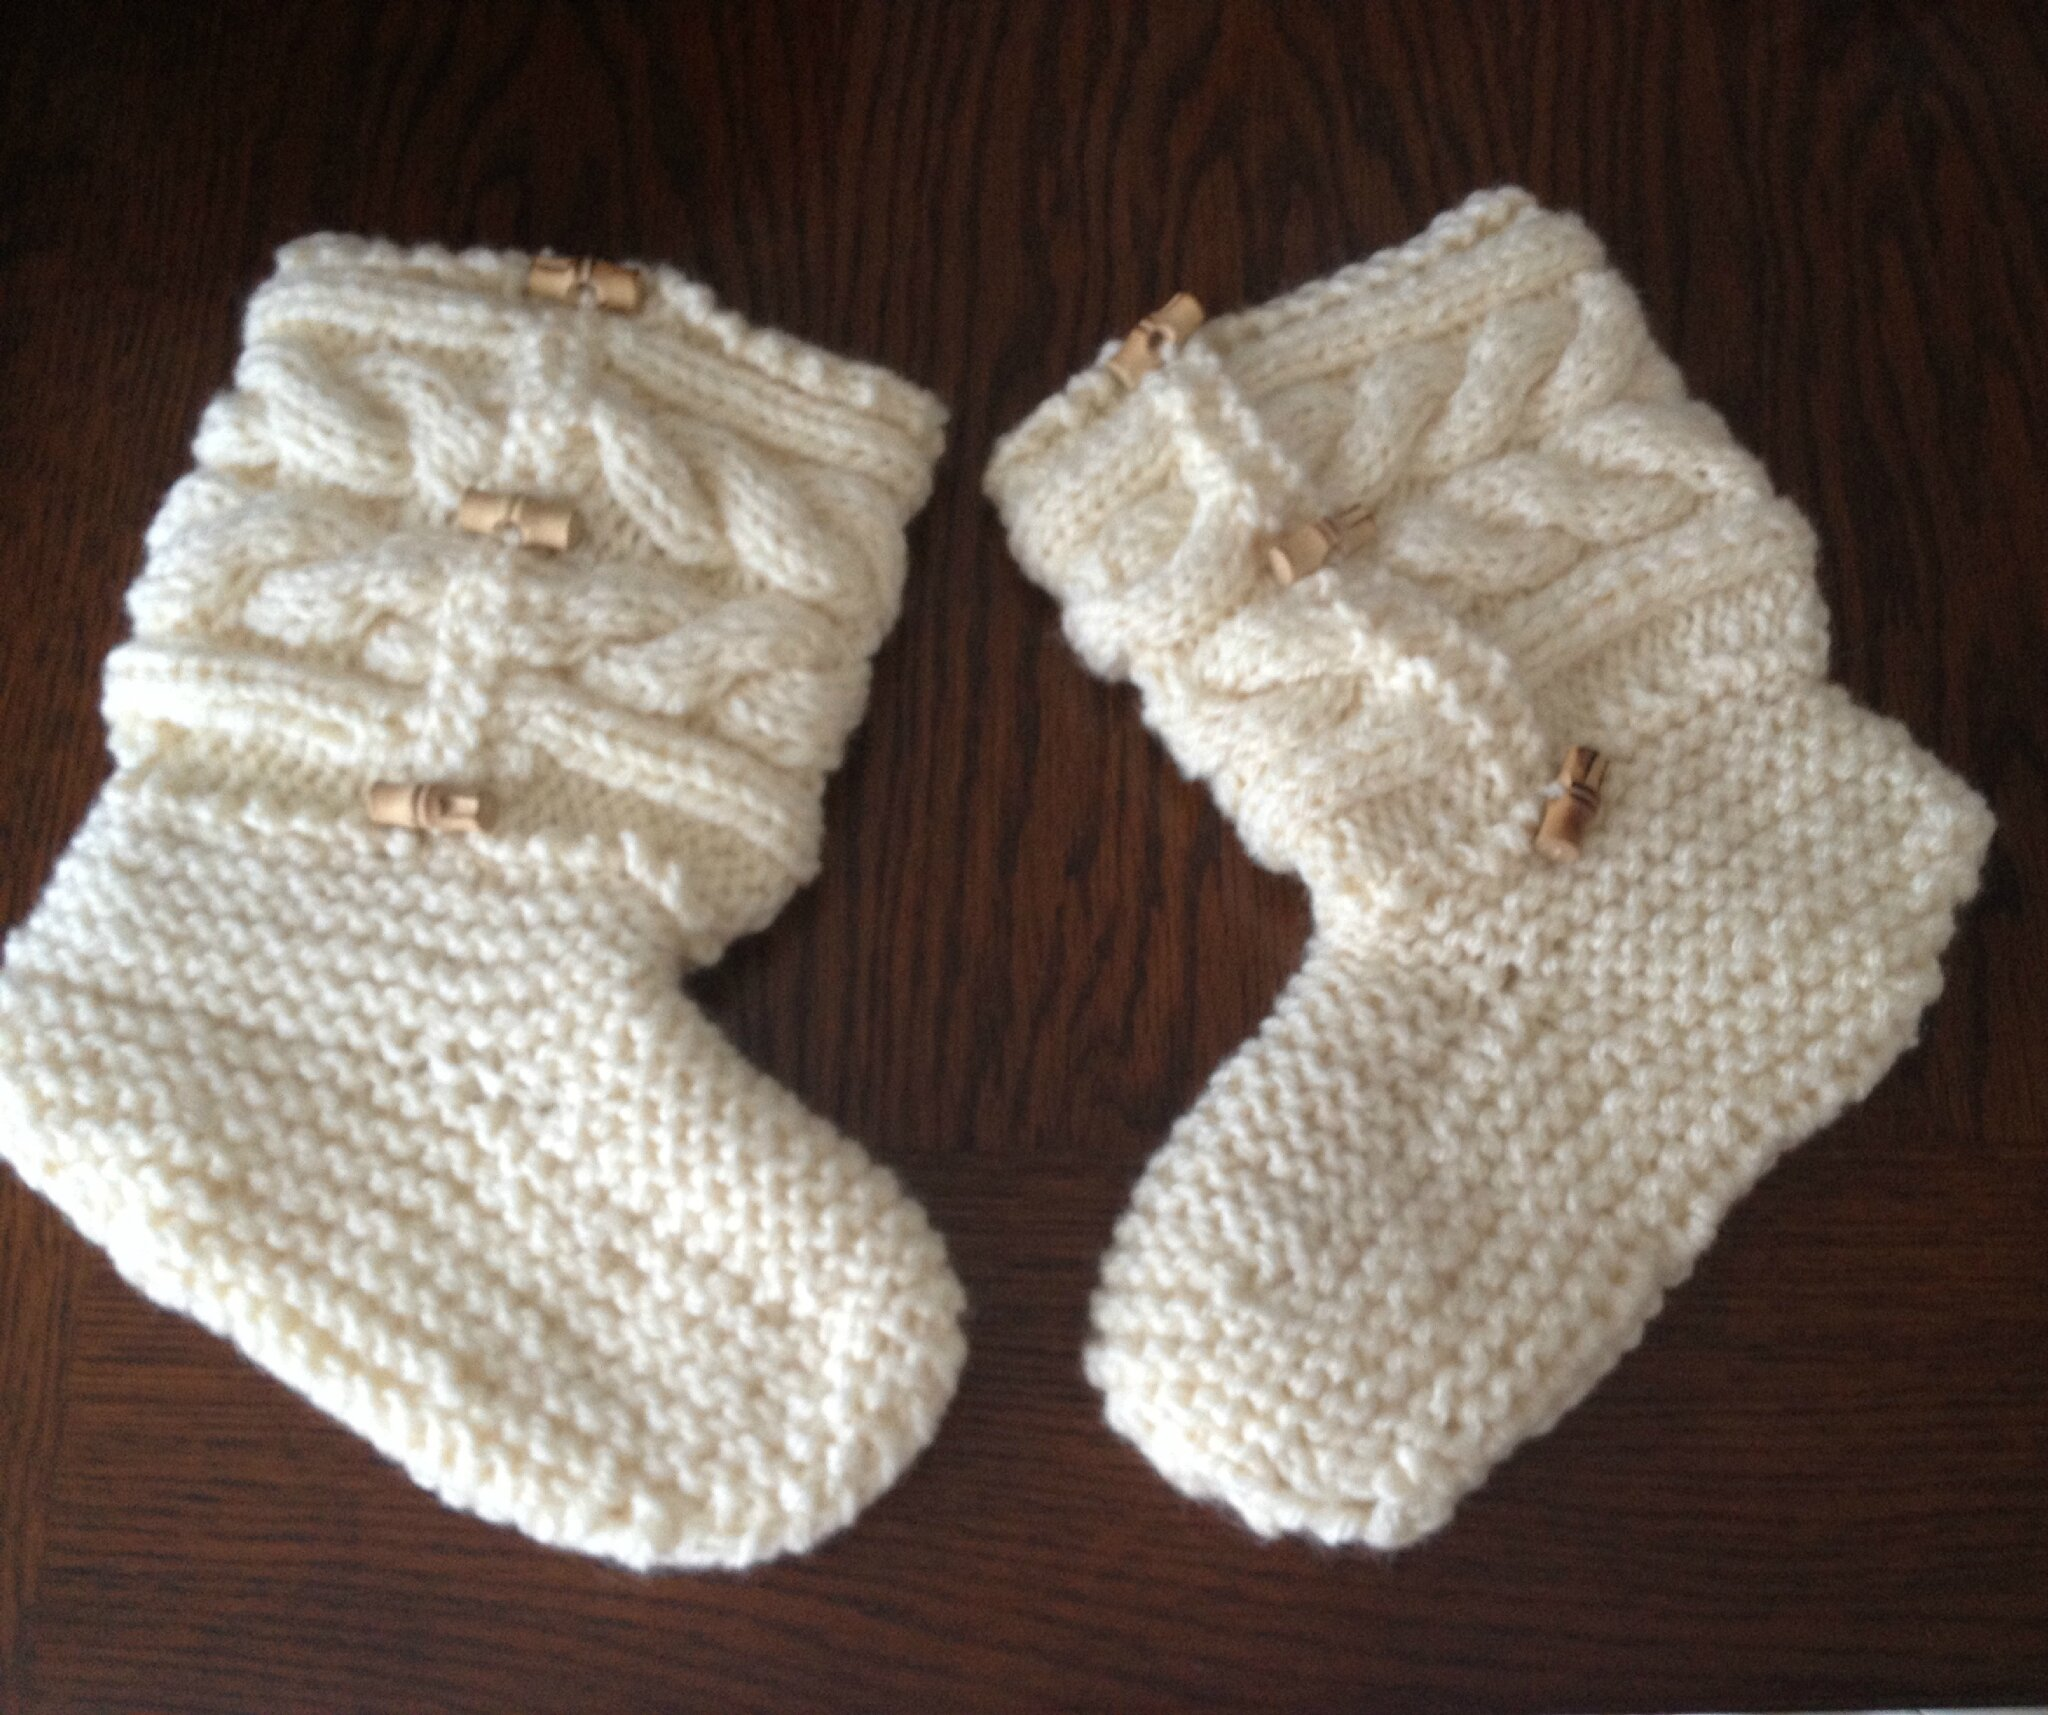 Mes jolis chaussons au tricot!!!!!!!